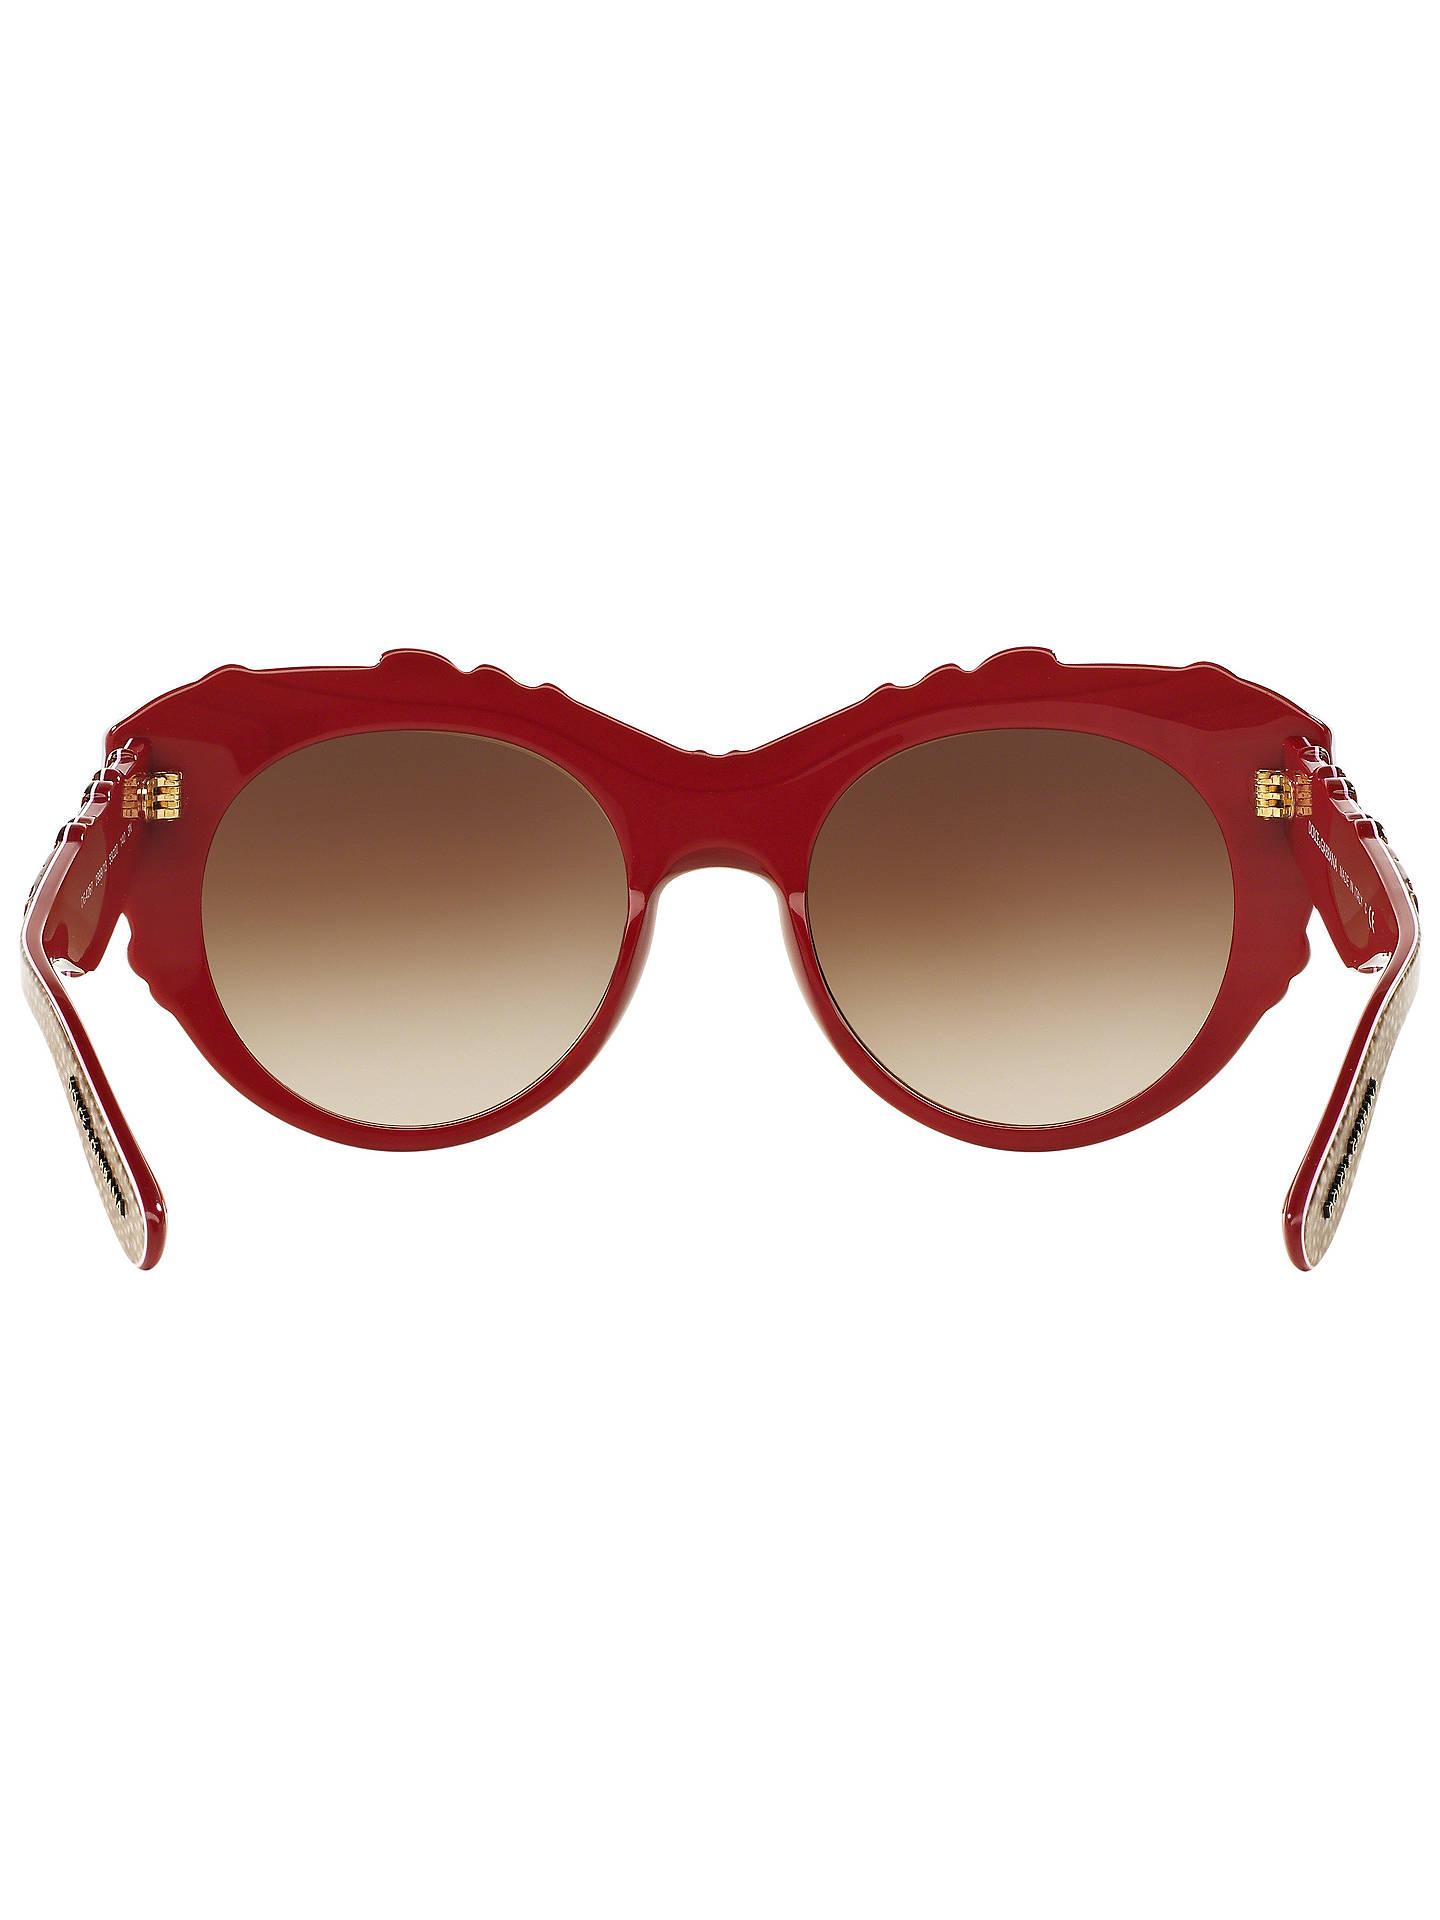 2e1cc0d5e0d9 Dolce   Gabbana DG4267 Round Embellished Sunglasses at John Lewis ...